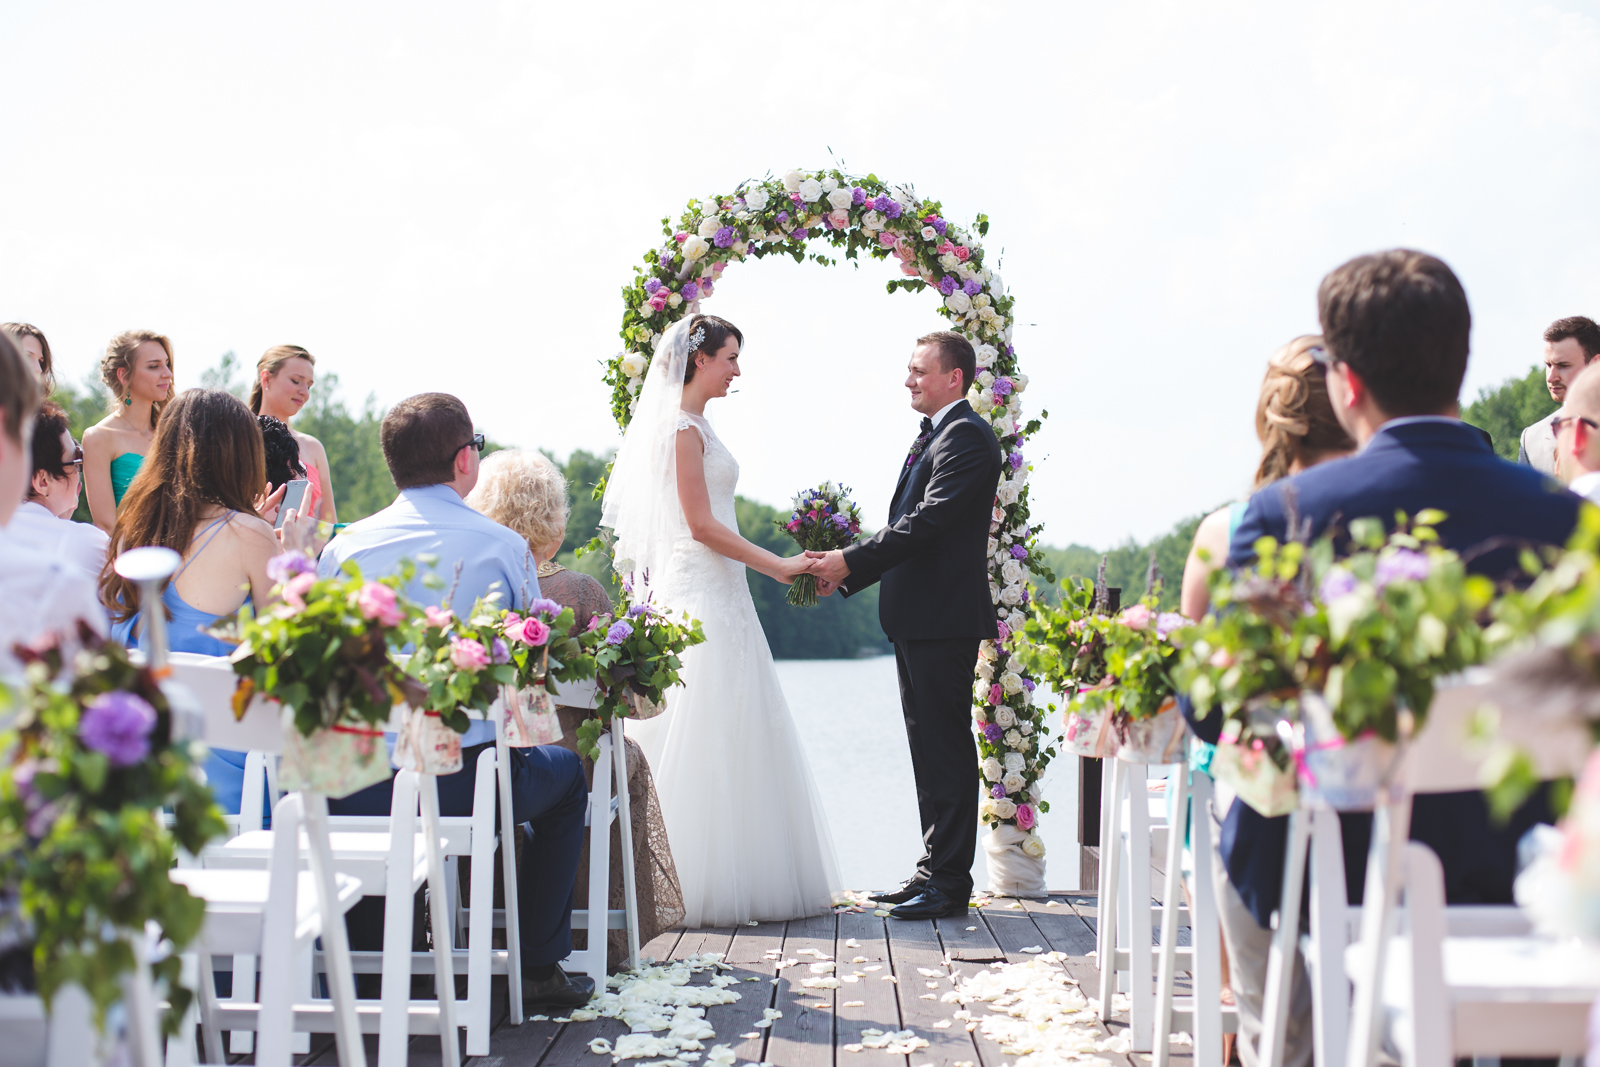 Как происходит регистрация брака за границей